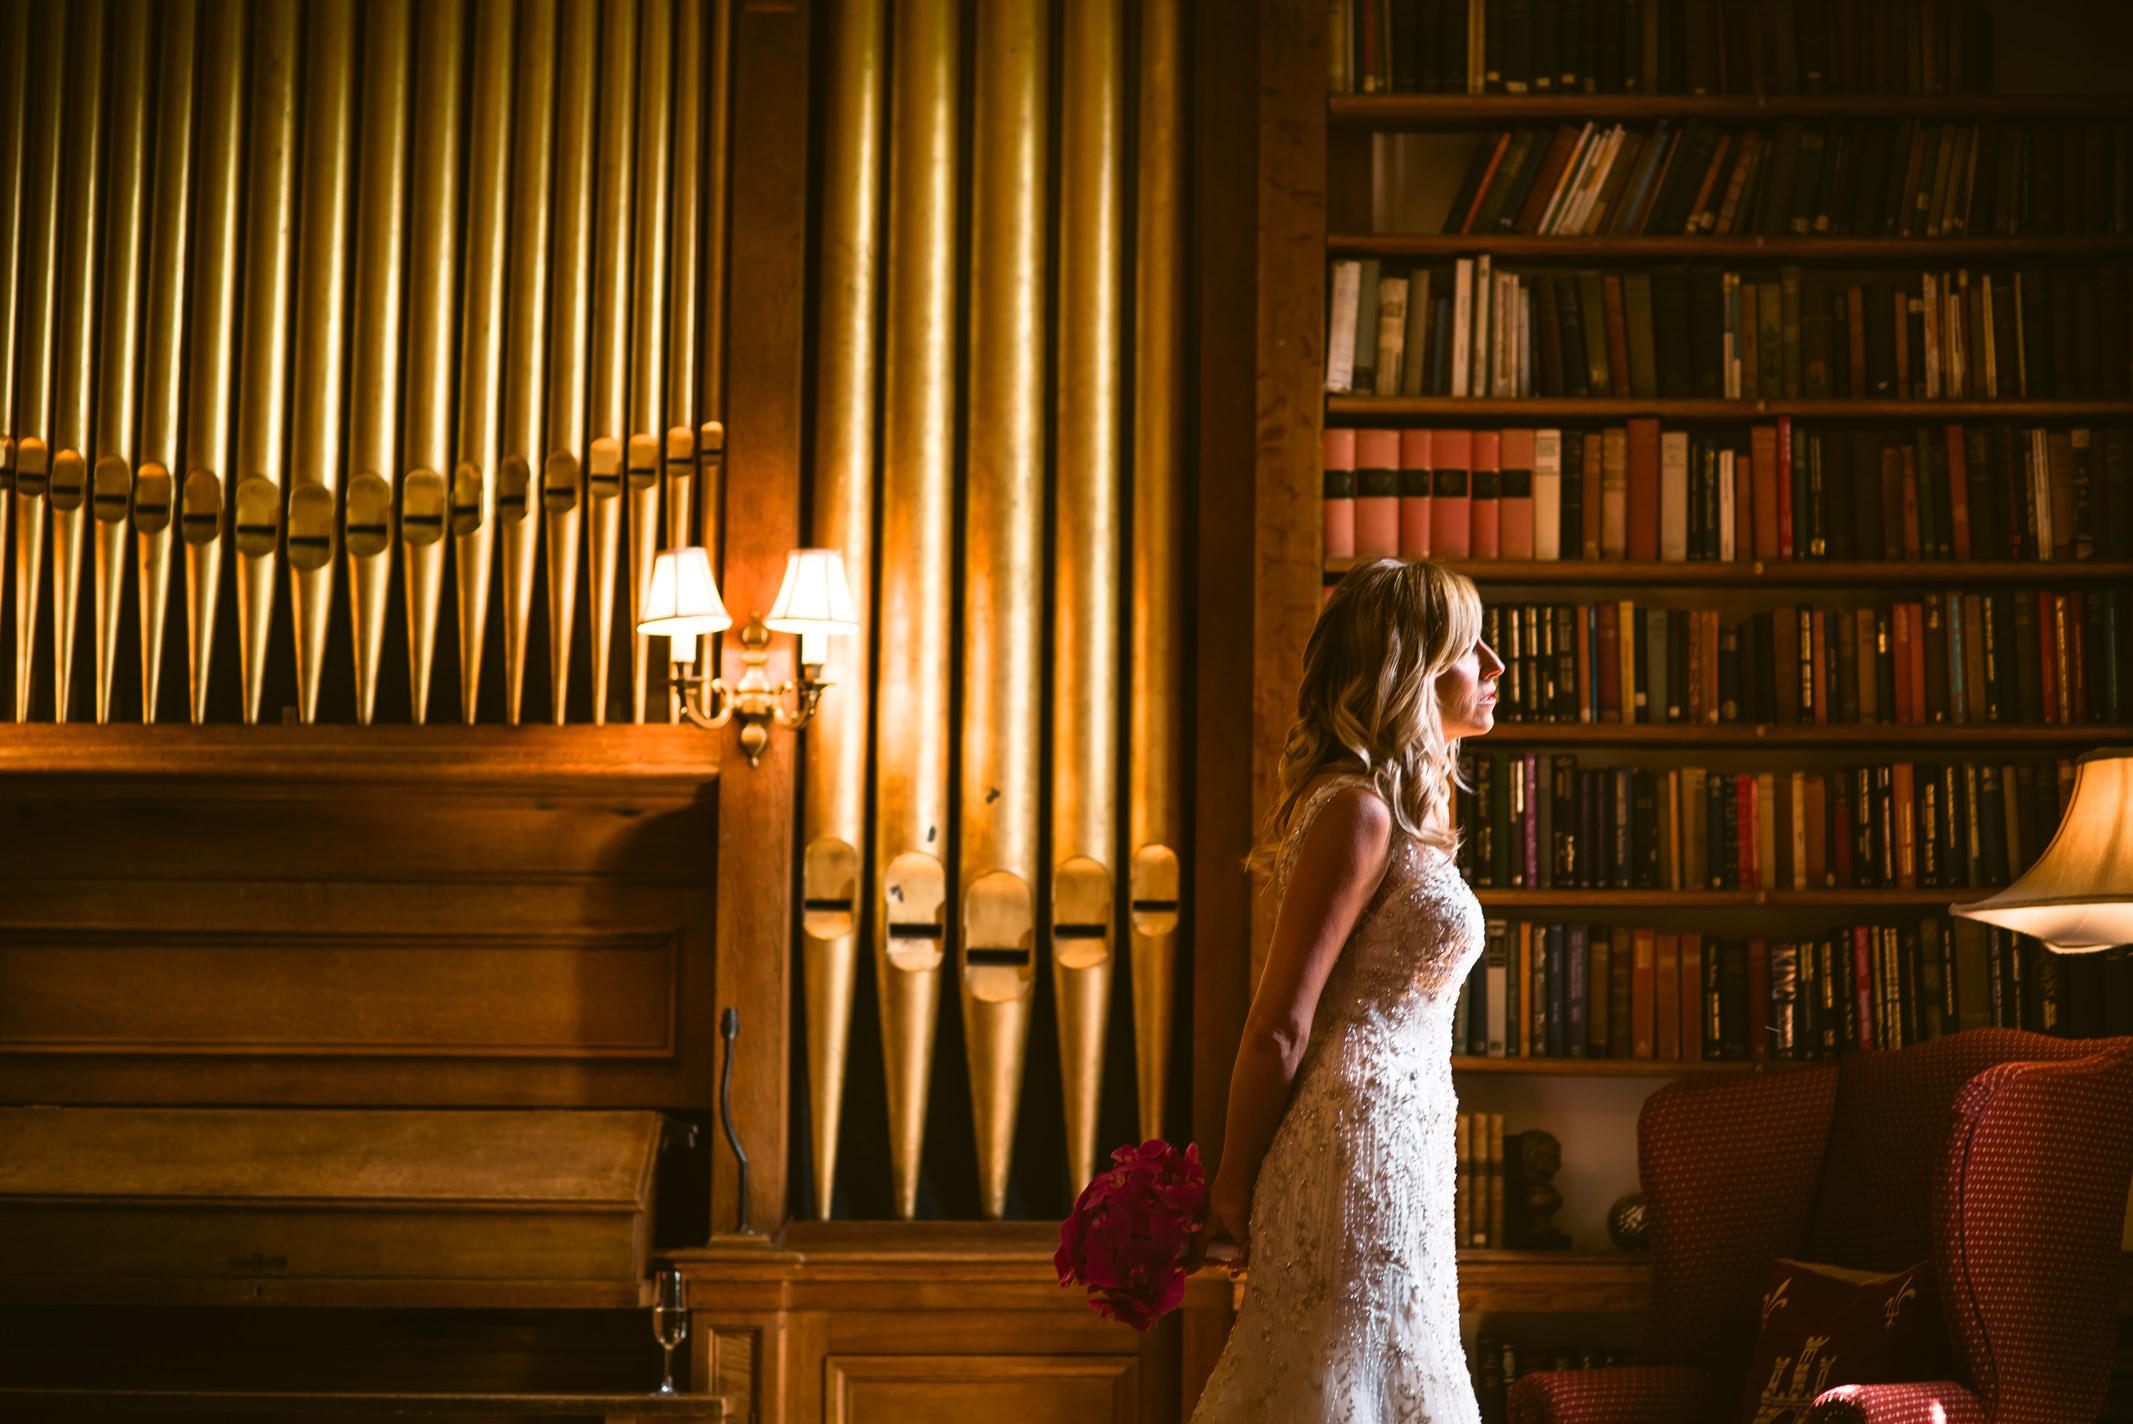 carberry-tower-edinburgh-wedding-venue-(6).jpg